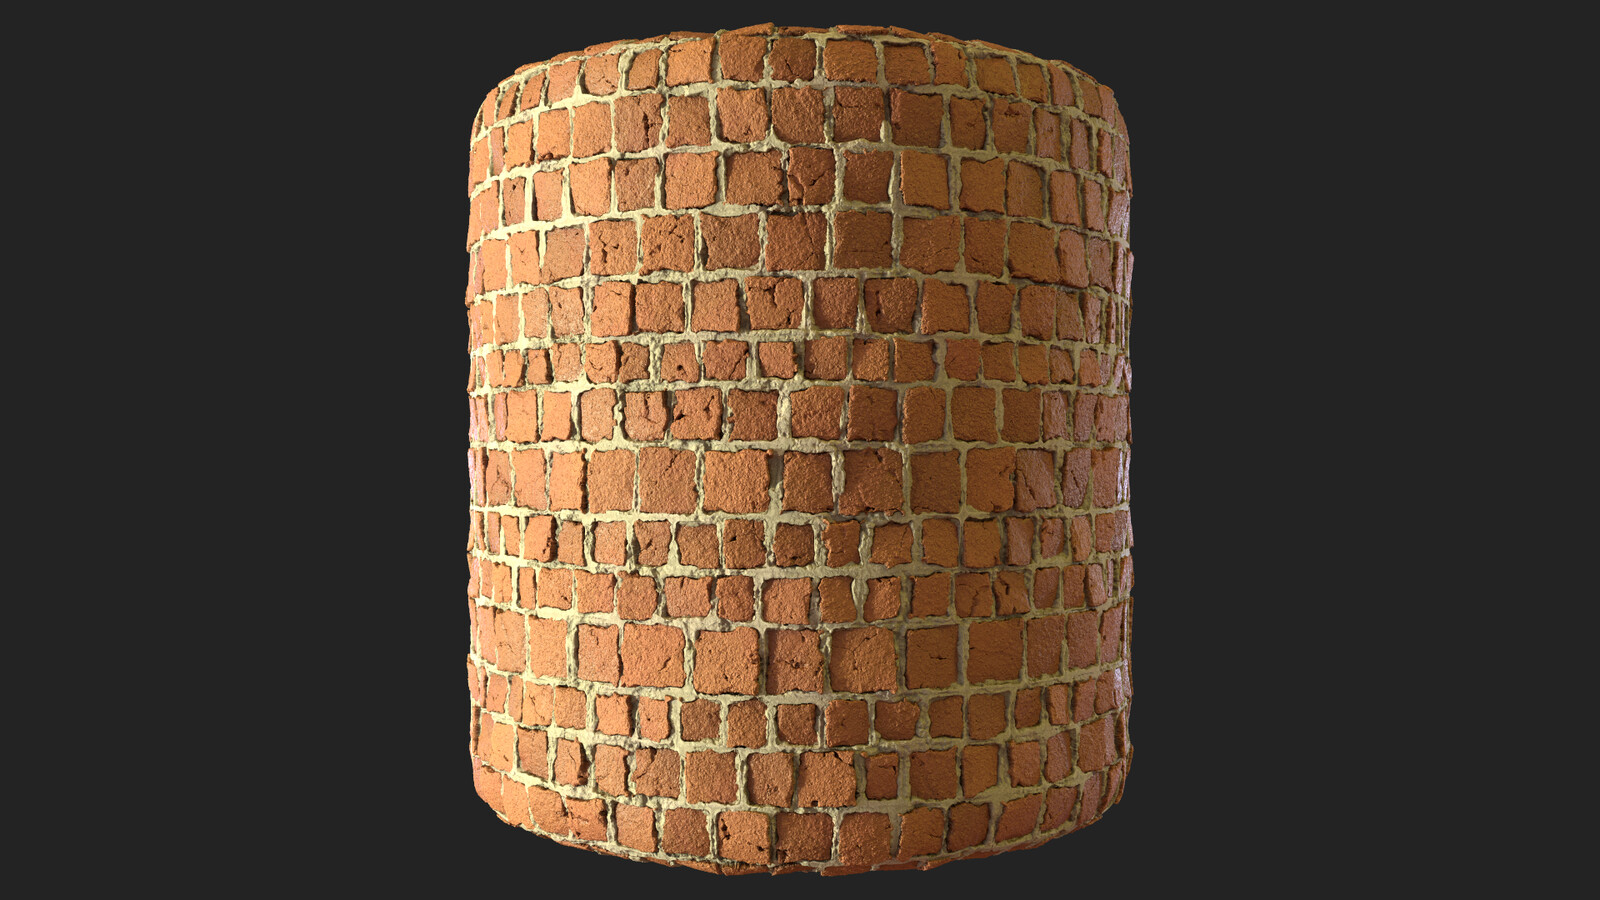 Brick Material Variations